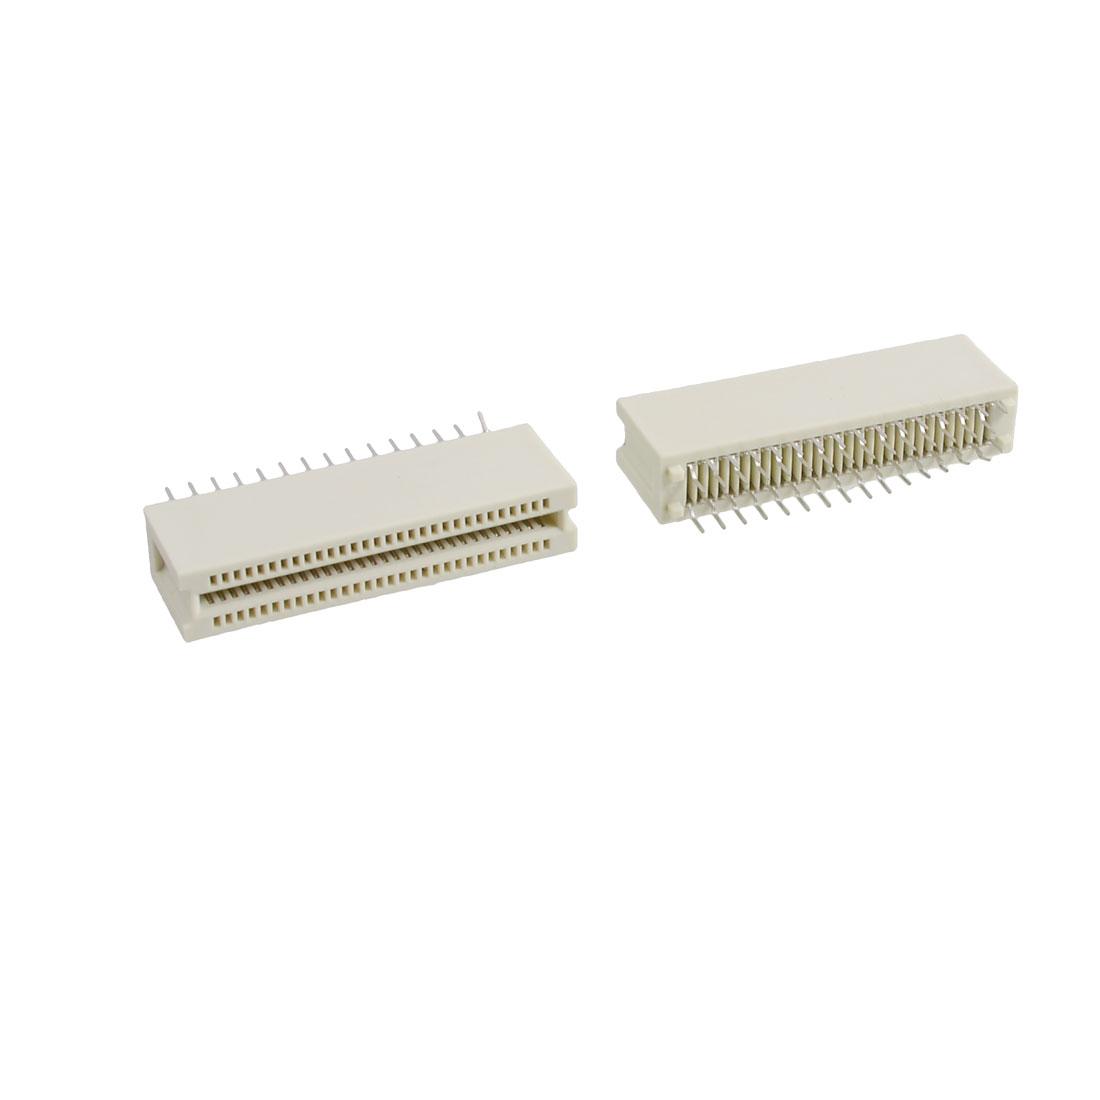 5 Pcs 1.27mm Pitch 50 Pin PCI Card Edge Slot Connector Socket